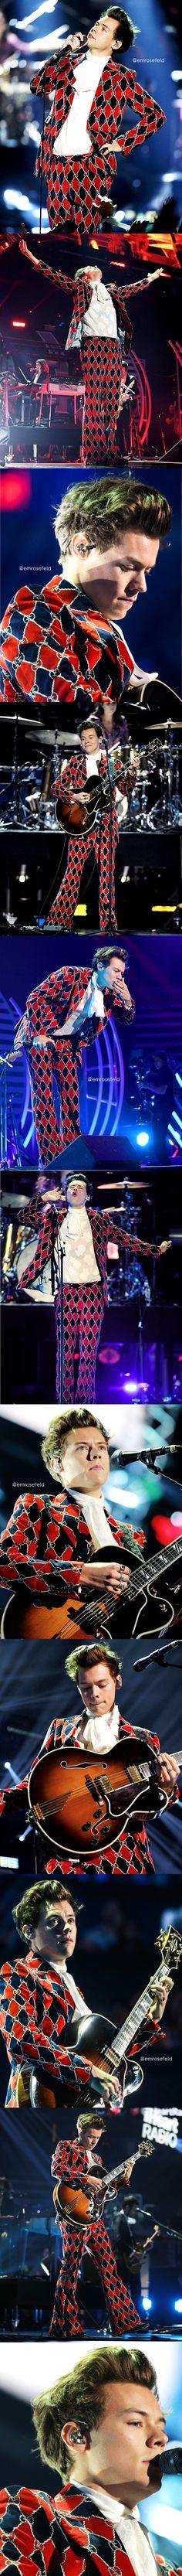 Harry Styles | iHeartRadio Music Festival 9.22.17 | emrosefeld |